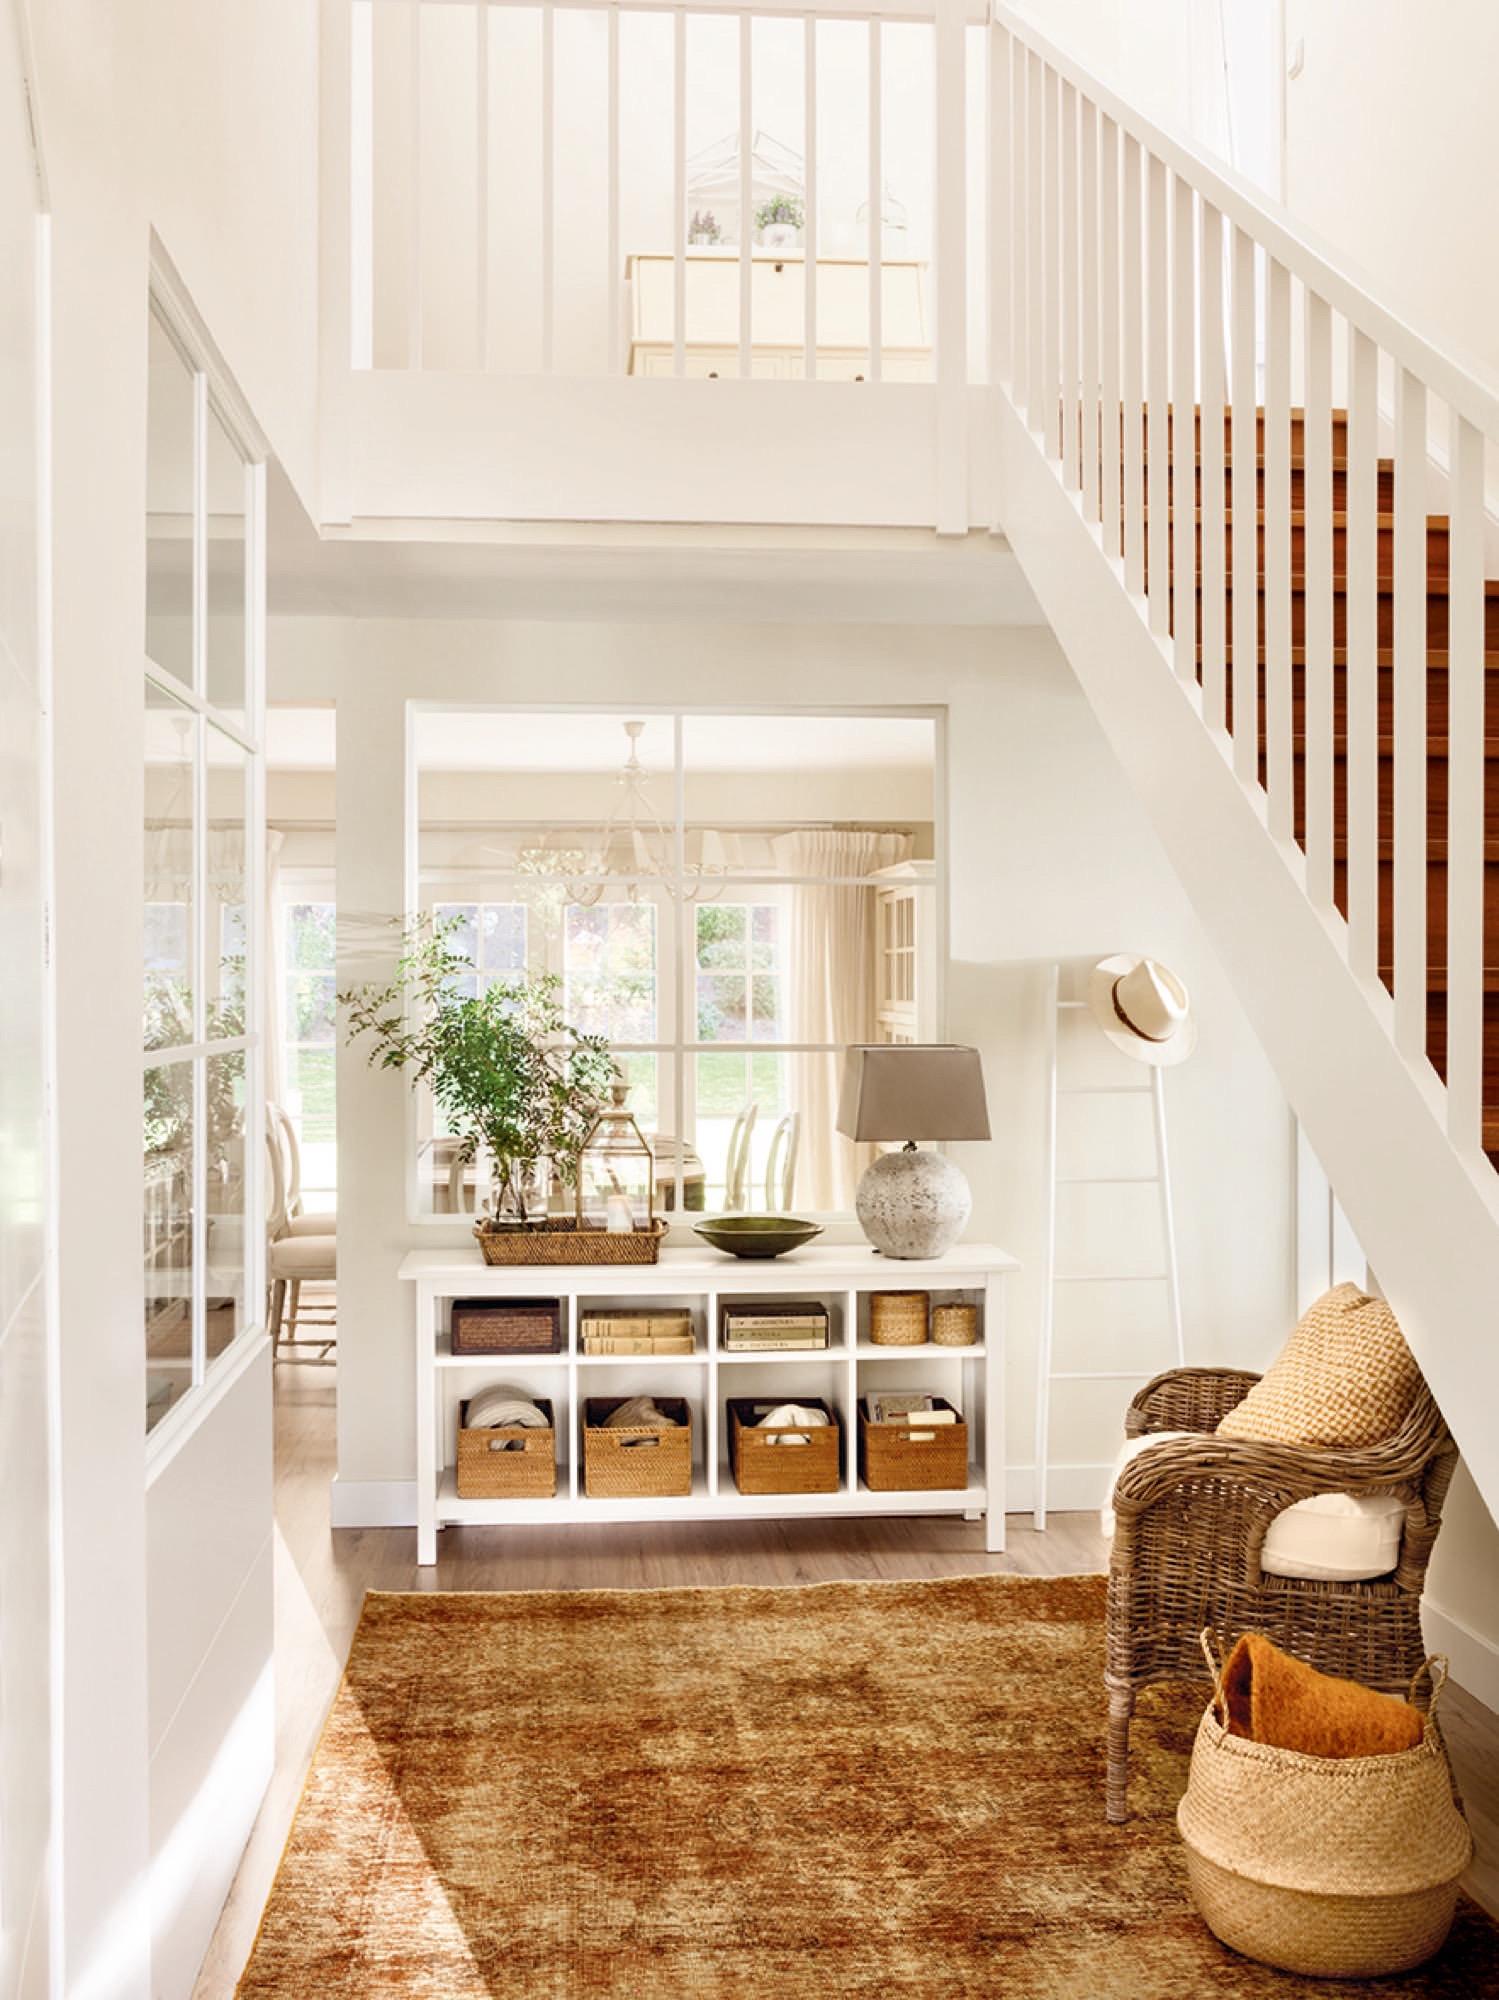 Una gran casa para una familia numerosa - Maceteros rectangulares grandes ...